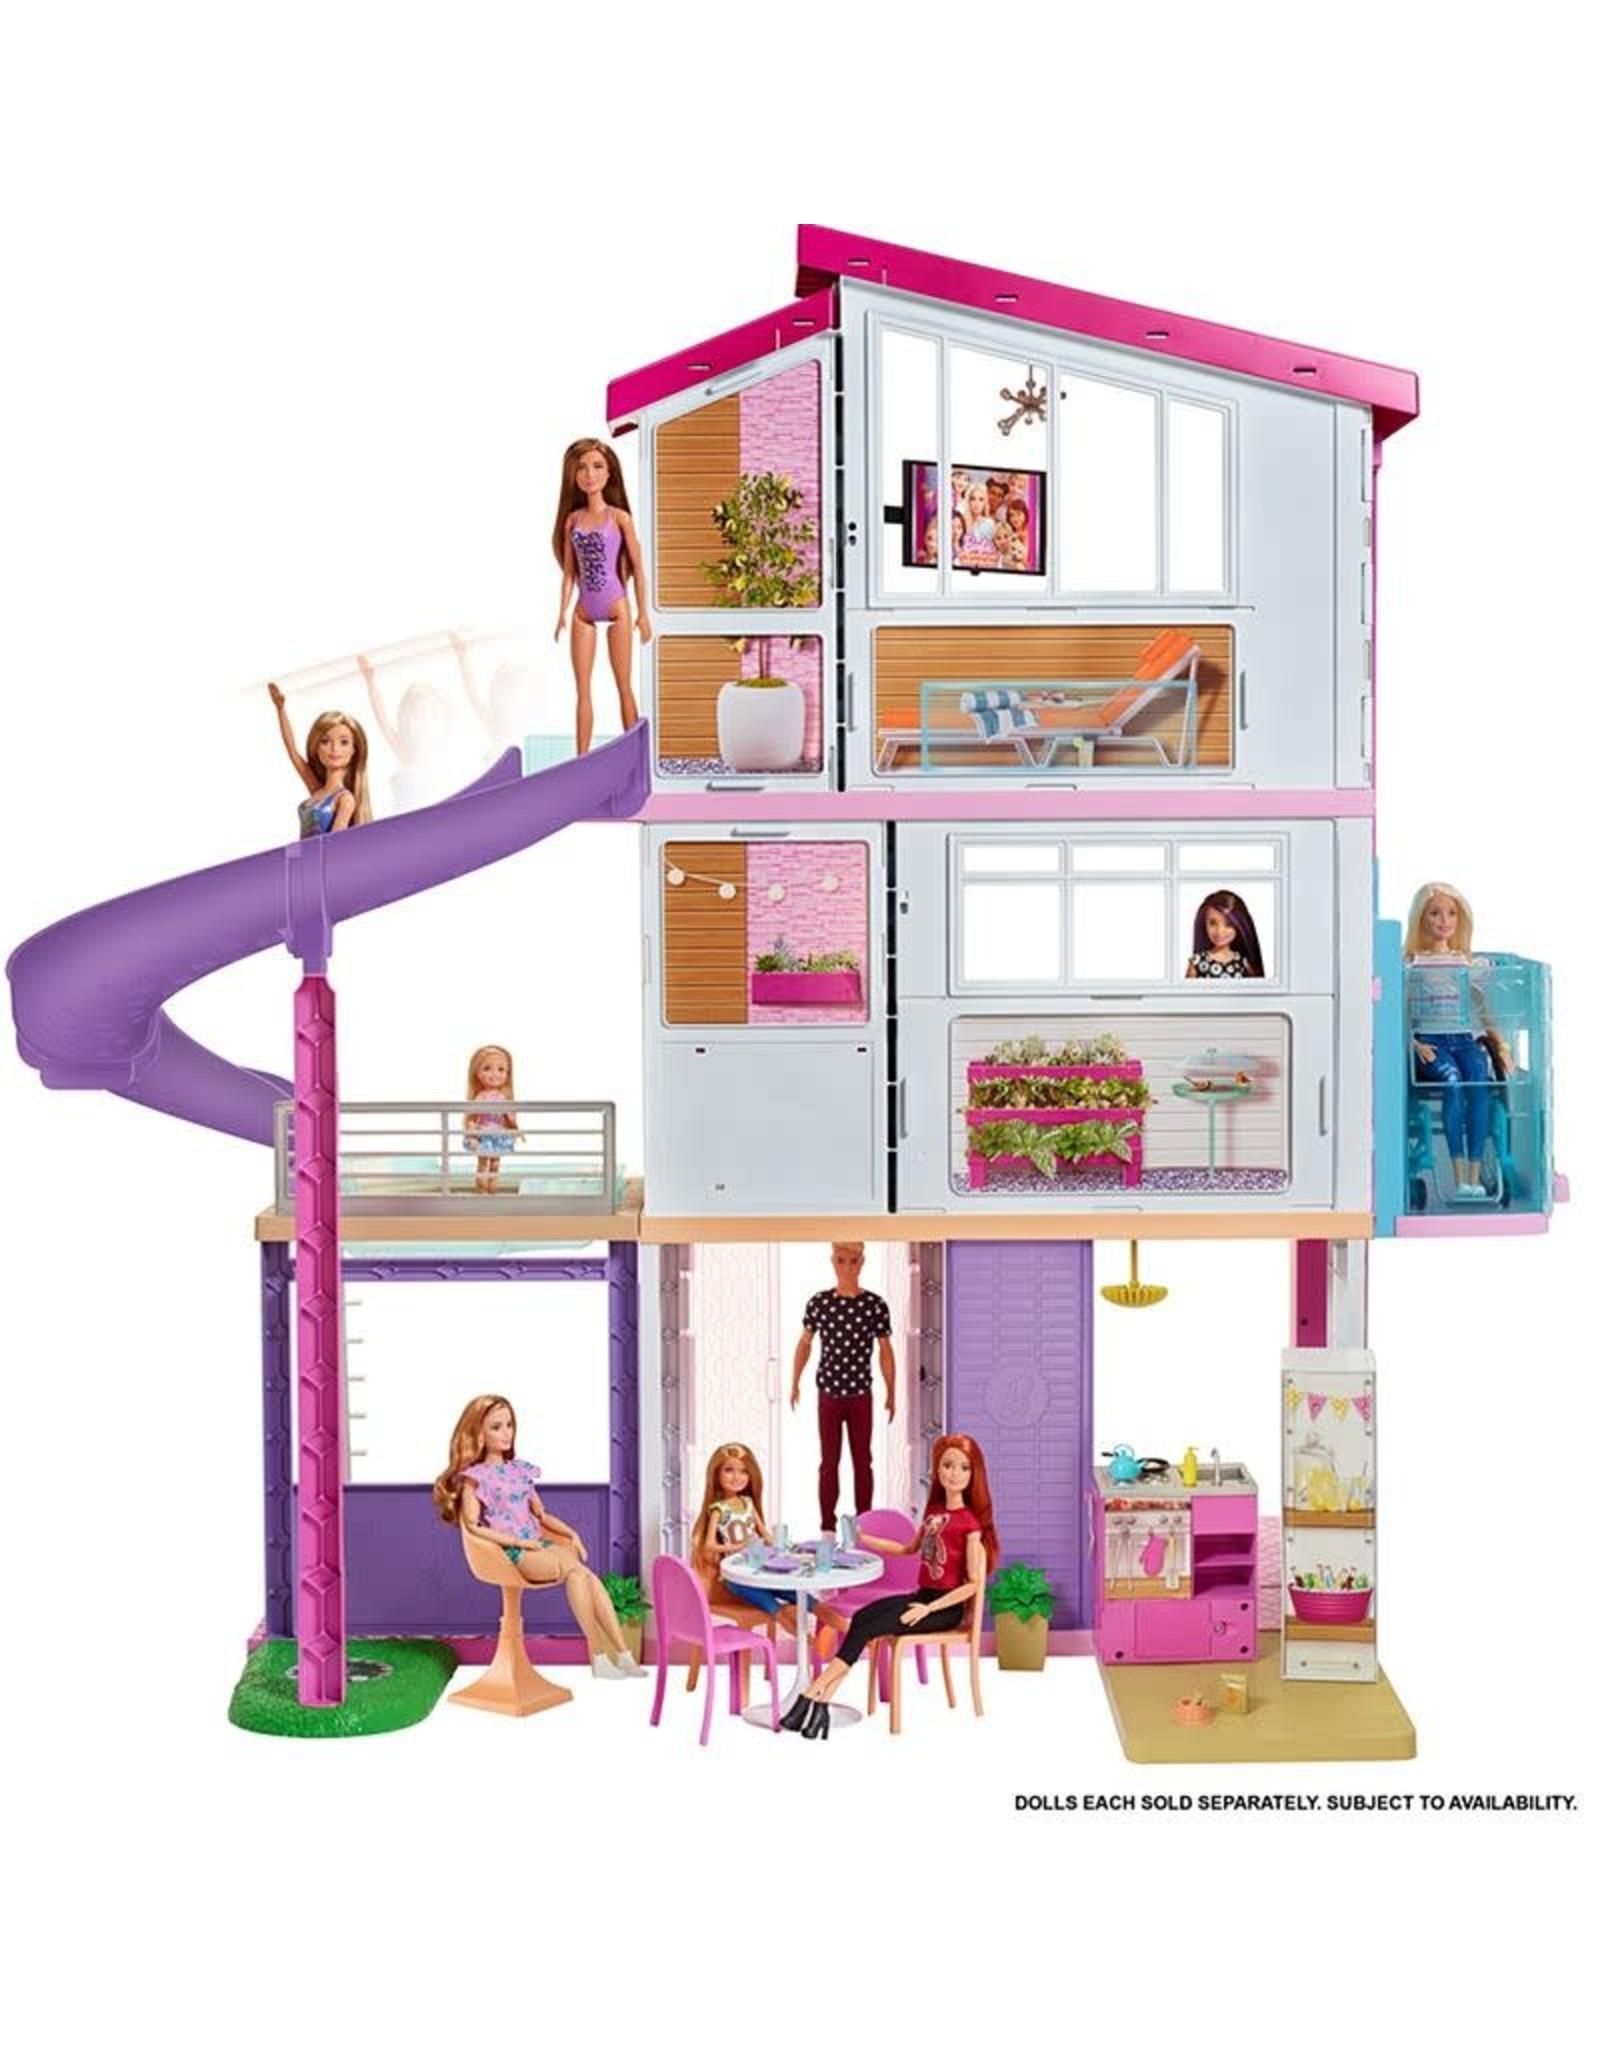 Mattel Barbie Dreamhouse with Ramp